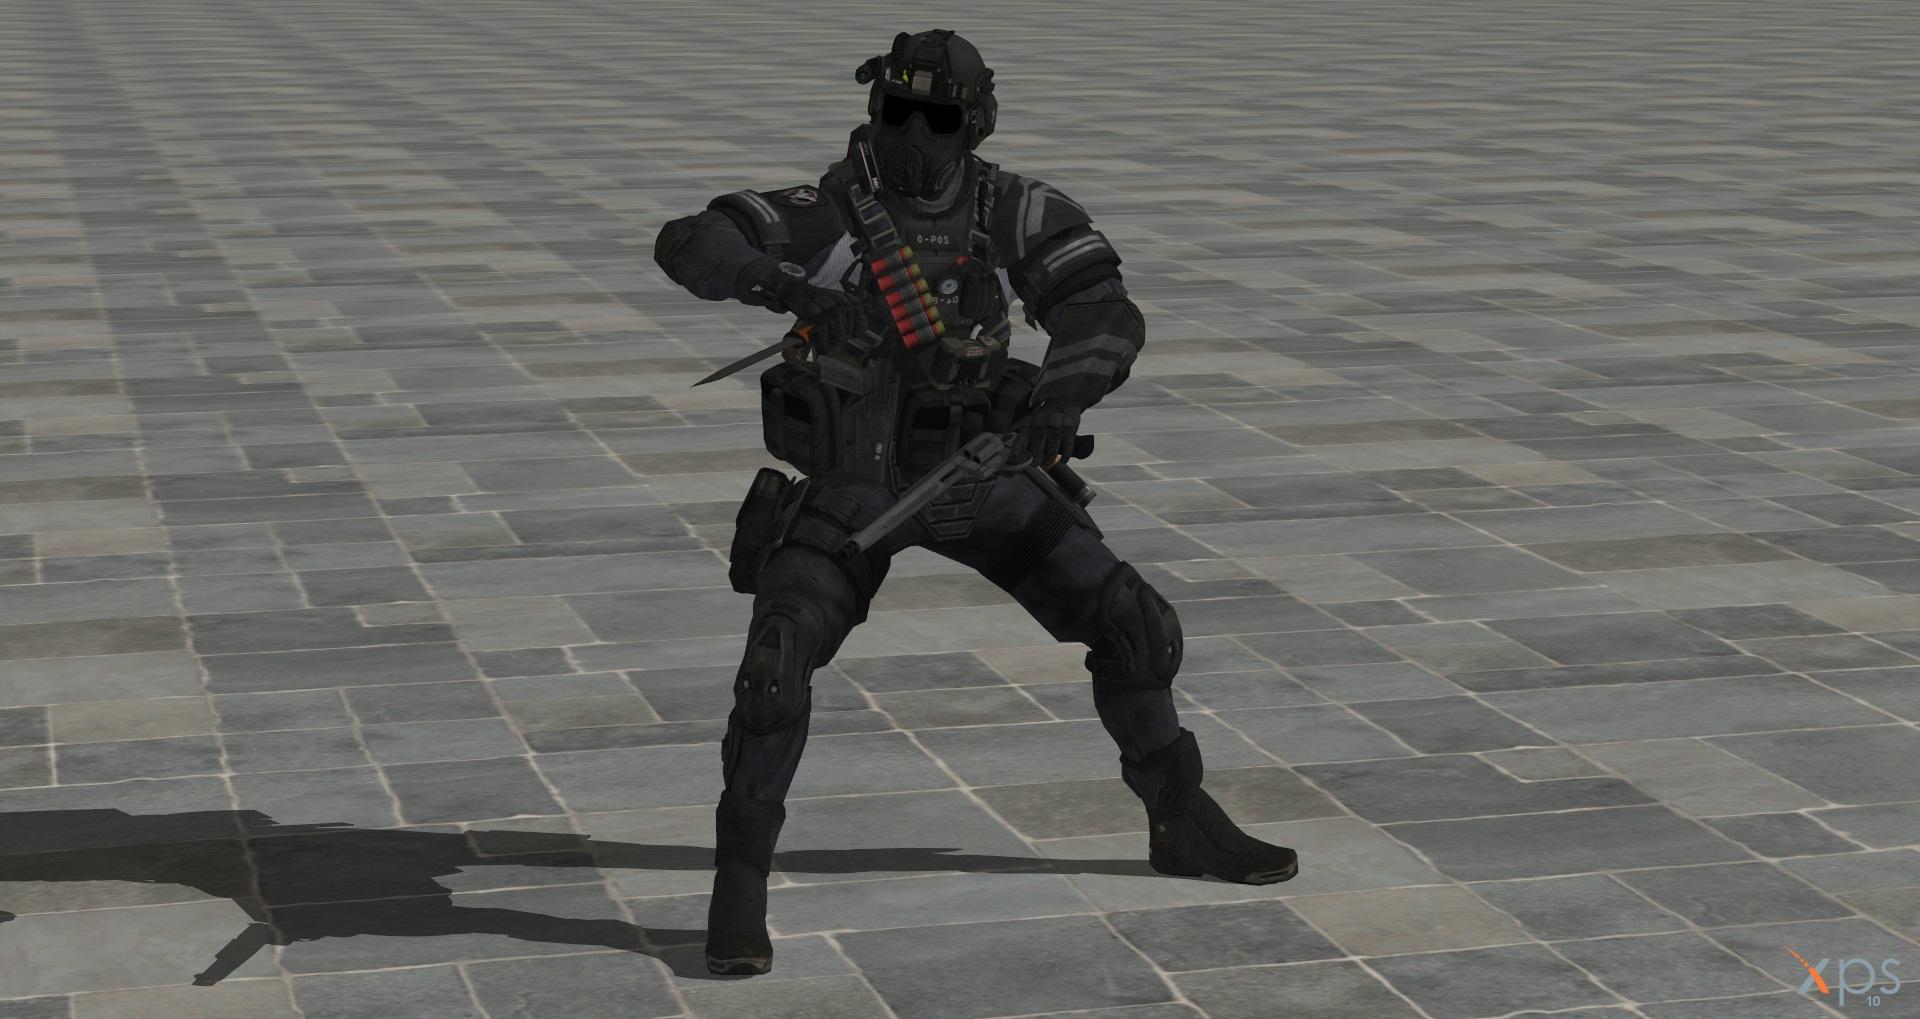 Cod Ghost Maniac Juggernaut For Xnalara By Elly Klamsky On Deviantart